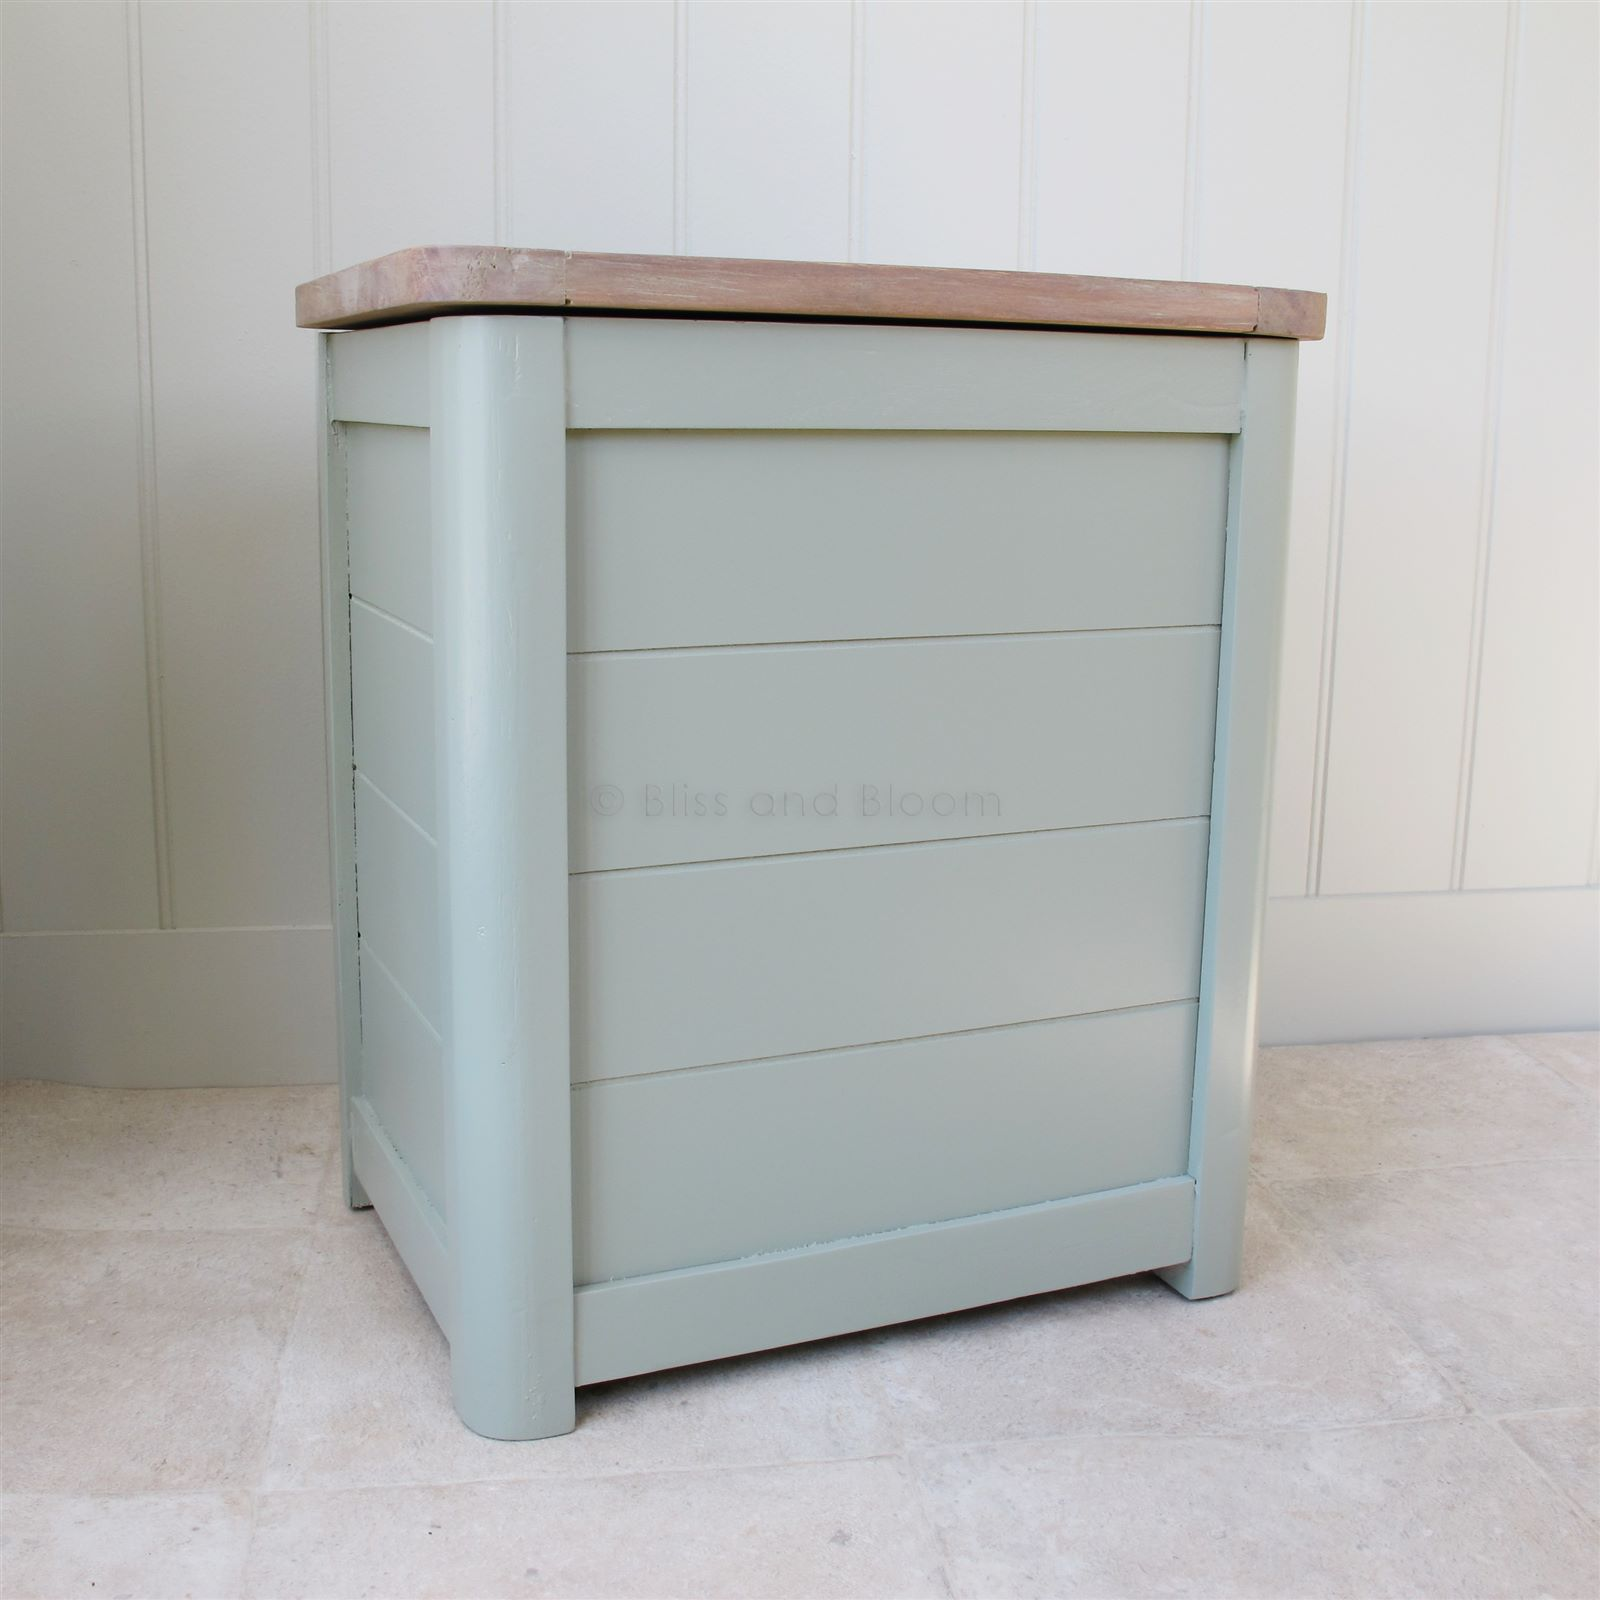 Wooden Laundry Bin Small